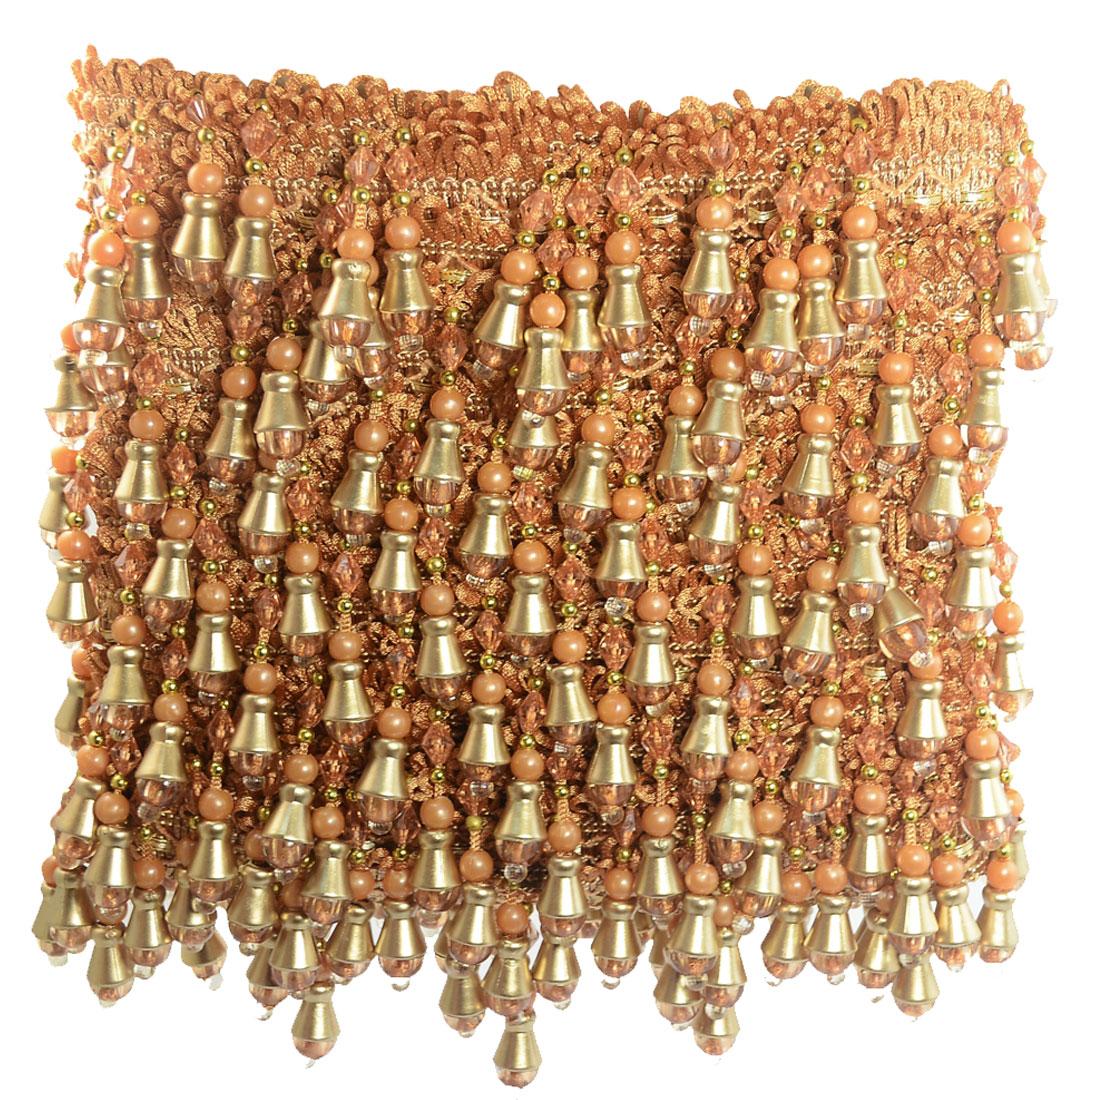 Plastic Beaded Curtain Trim Tassel Fringe Drapery Craft Sewing Decor 12M